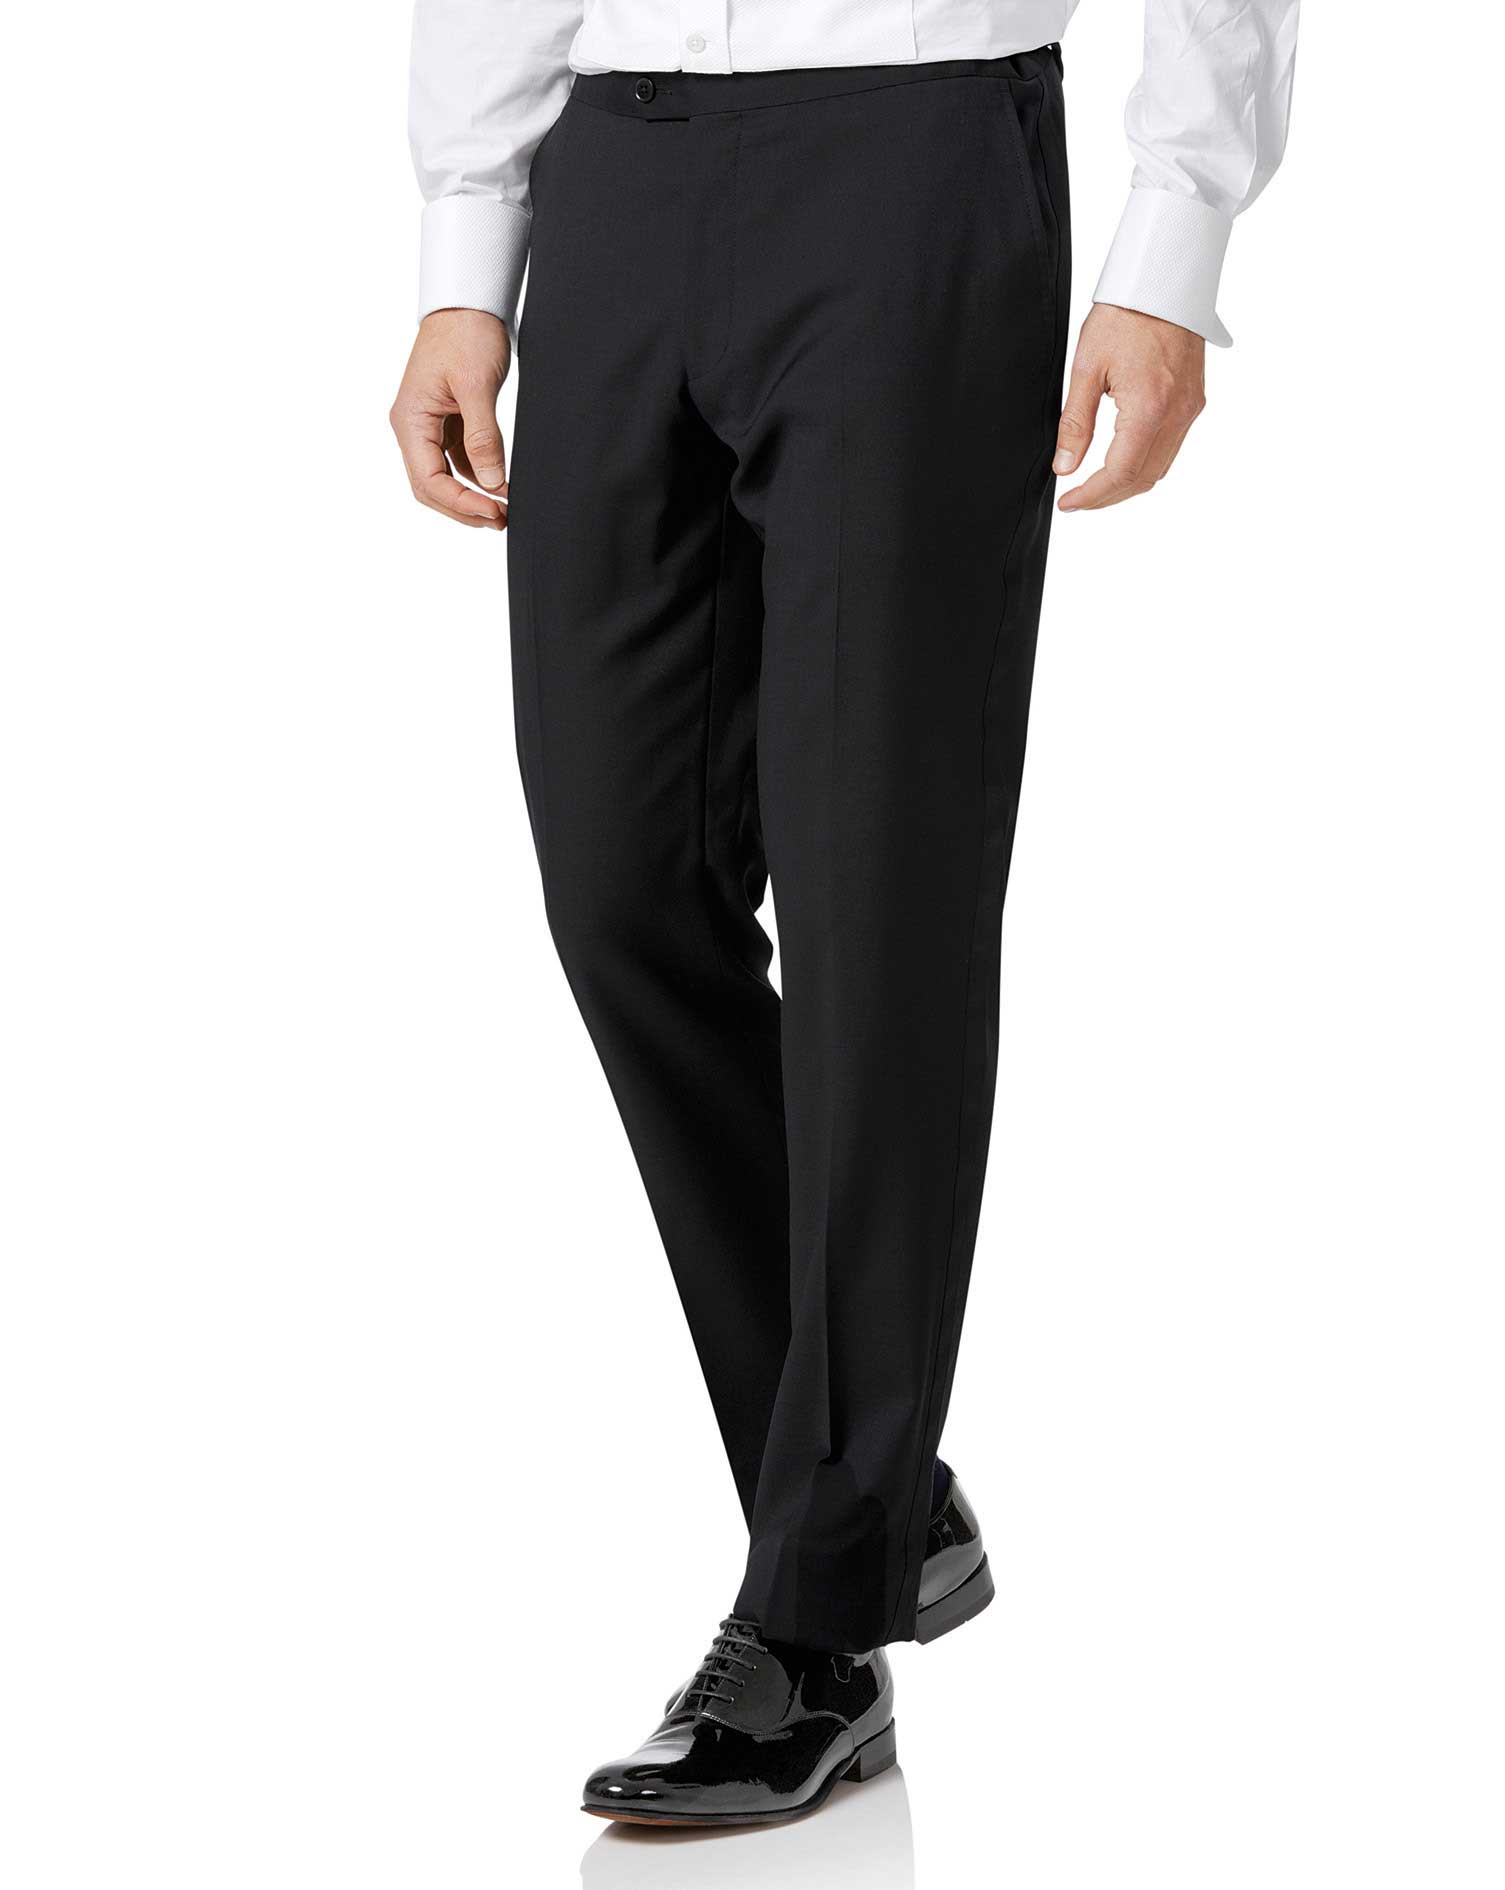 Black Slim Fit Tuxedo Trousers Size W34 L32 by Charles Tyrwhitt